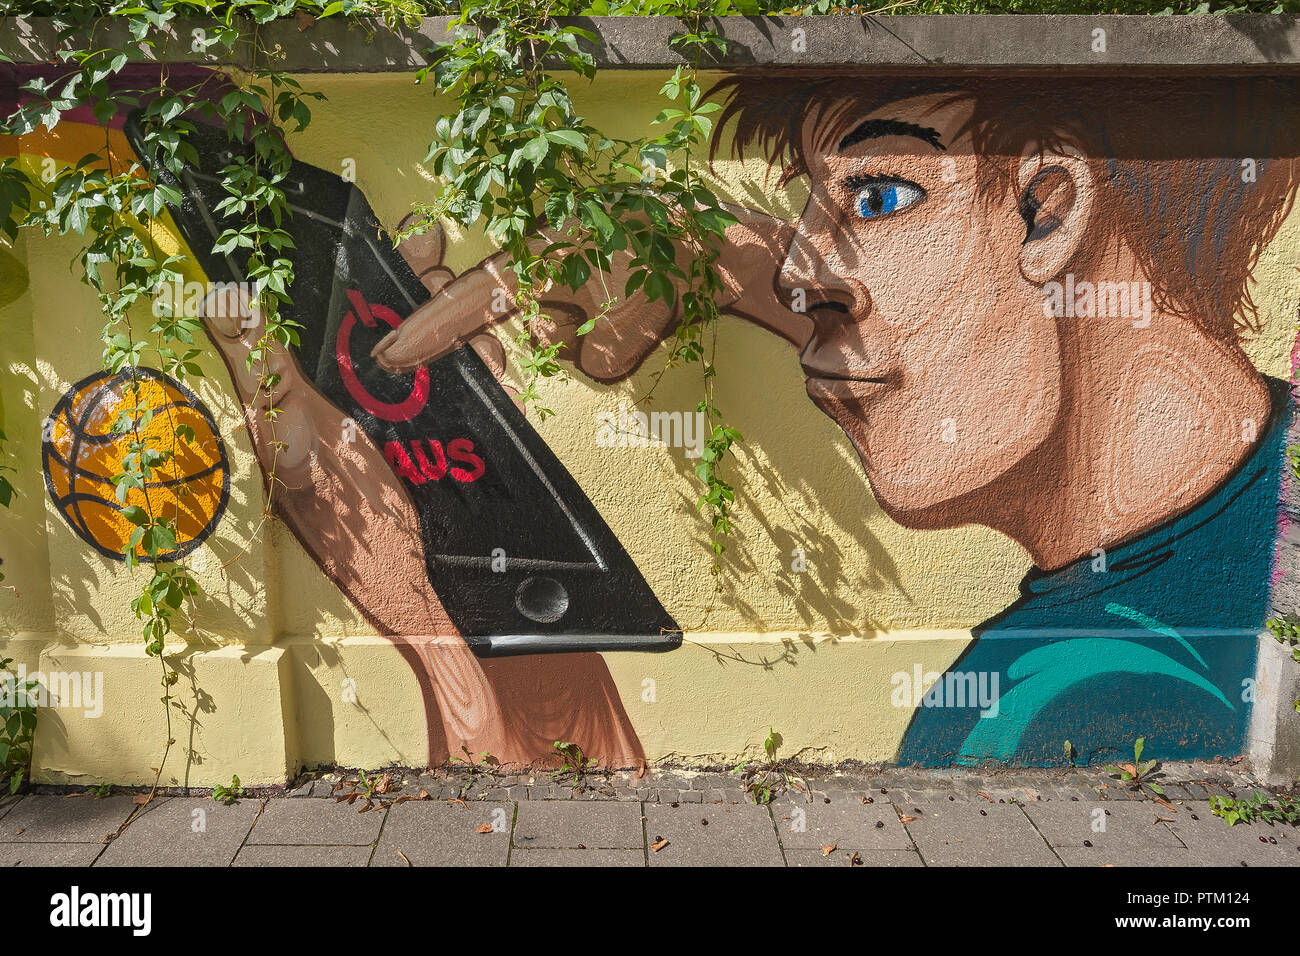 Graffiti on wall, man turns off smartphone, Munich, Upper Bavaria, Bavaria, Germany - Stock Image